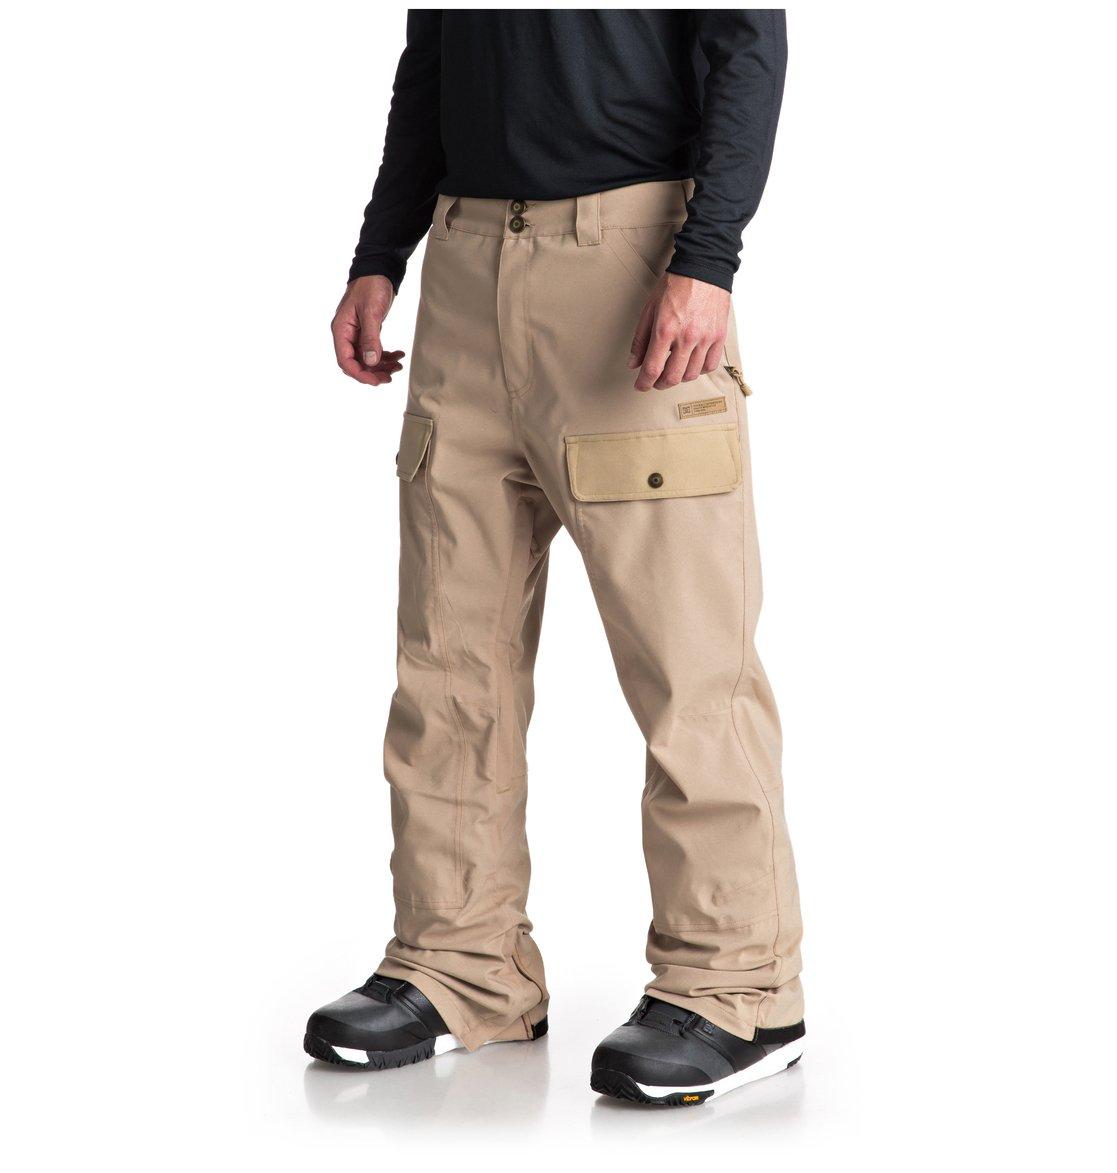 Pantalon De Pour Dc Asylum Shoes Homme Snow Edytp03033 zFdnwxRqB